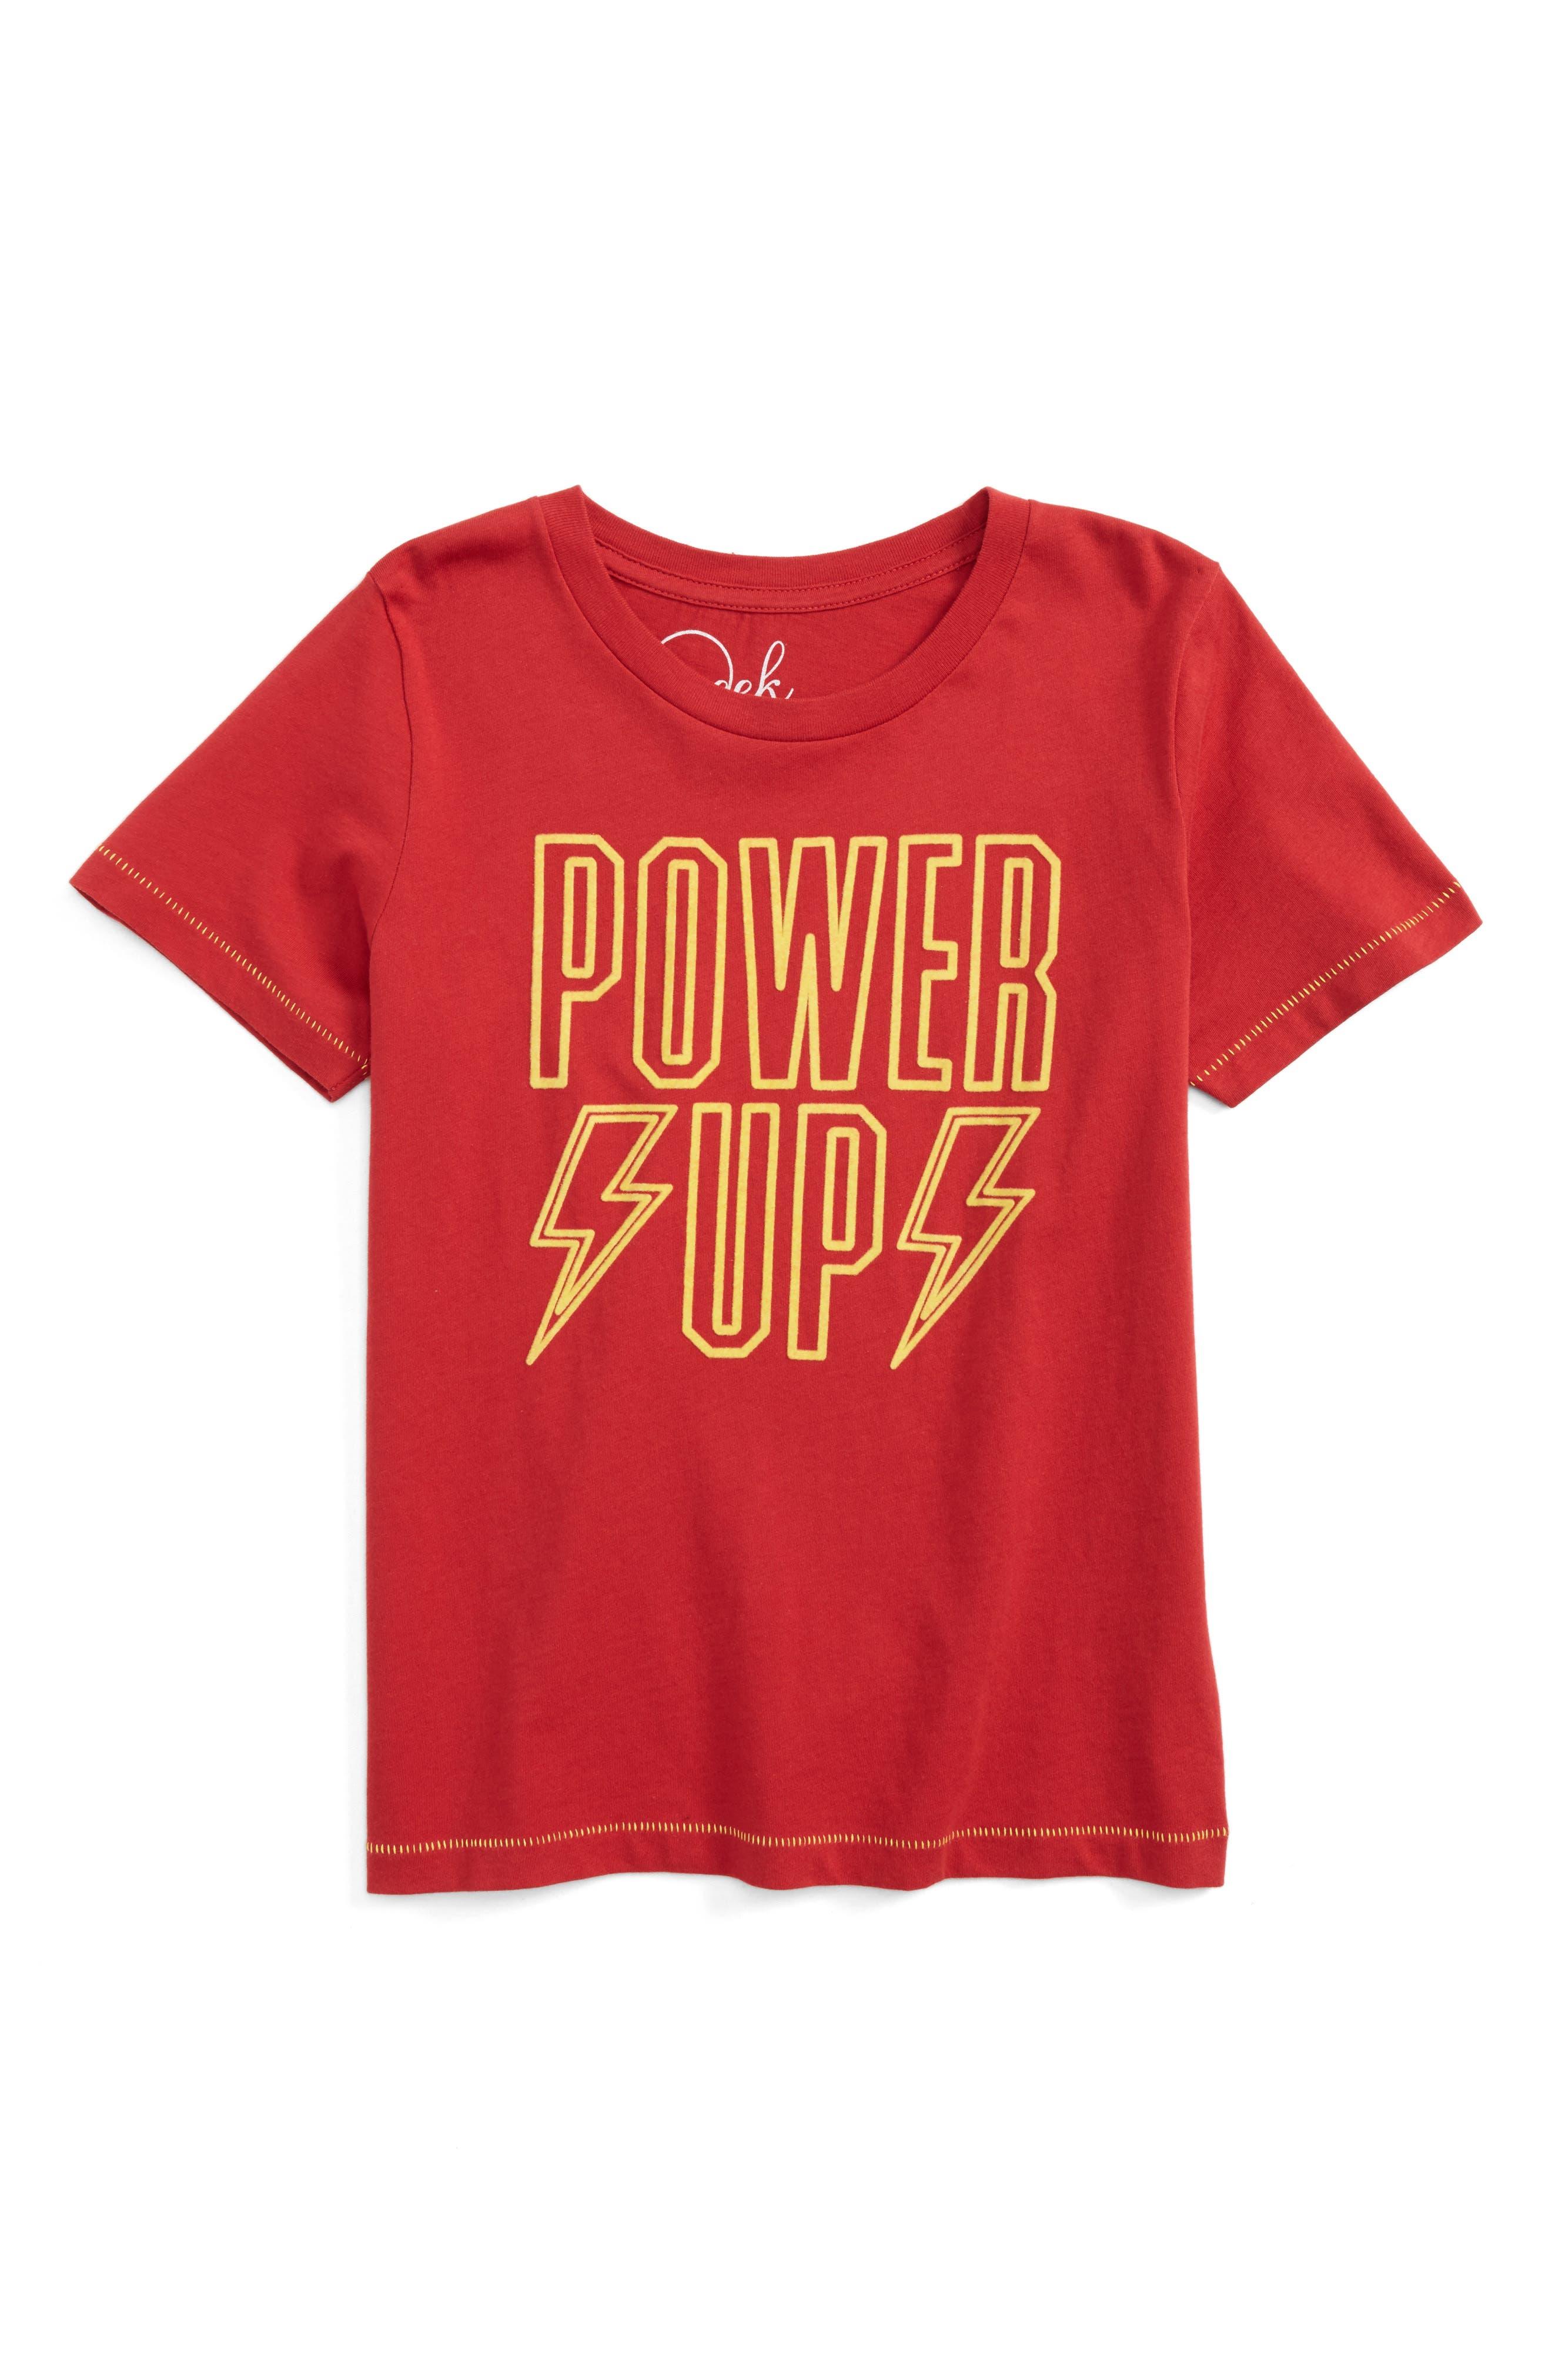 Alternate Image 1 Selected - Peek Power Up T-Shirt (Toddler Boys, Little Boys & Big Boys)